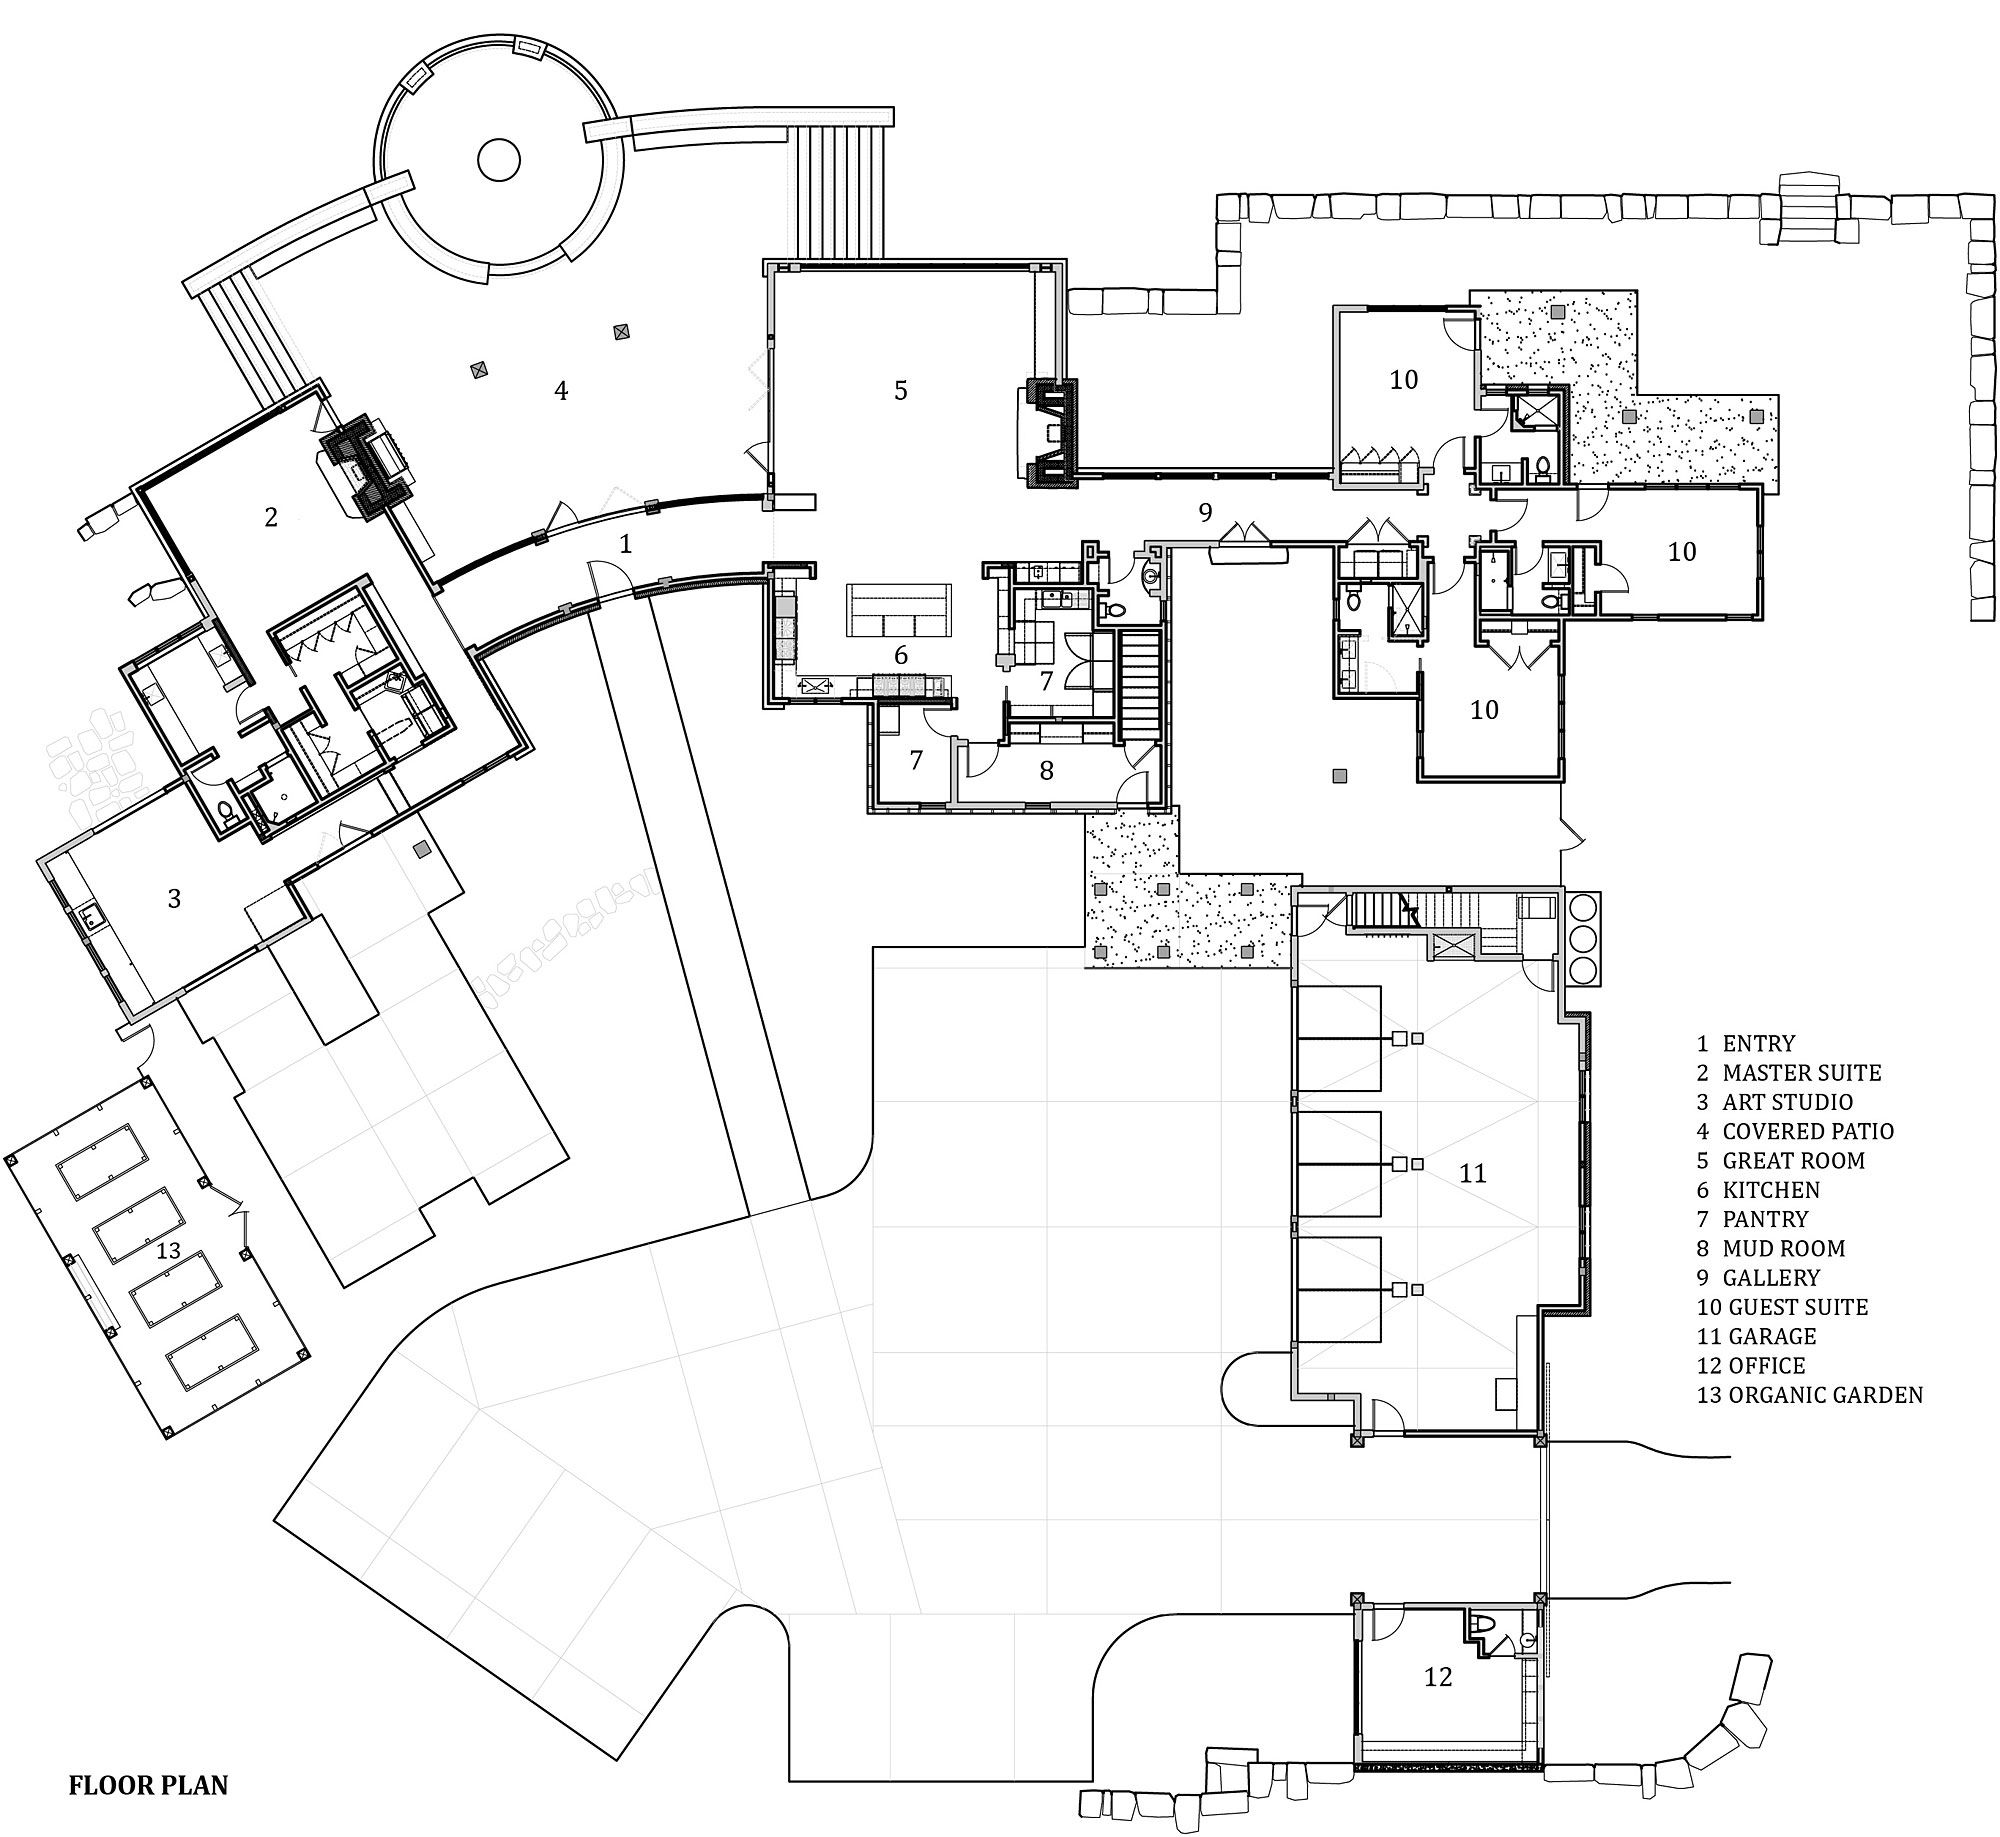 Locati Architects stock farm residencelocati architects | plans | pinterest